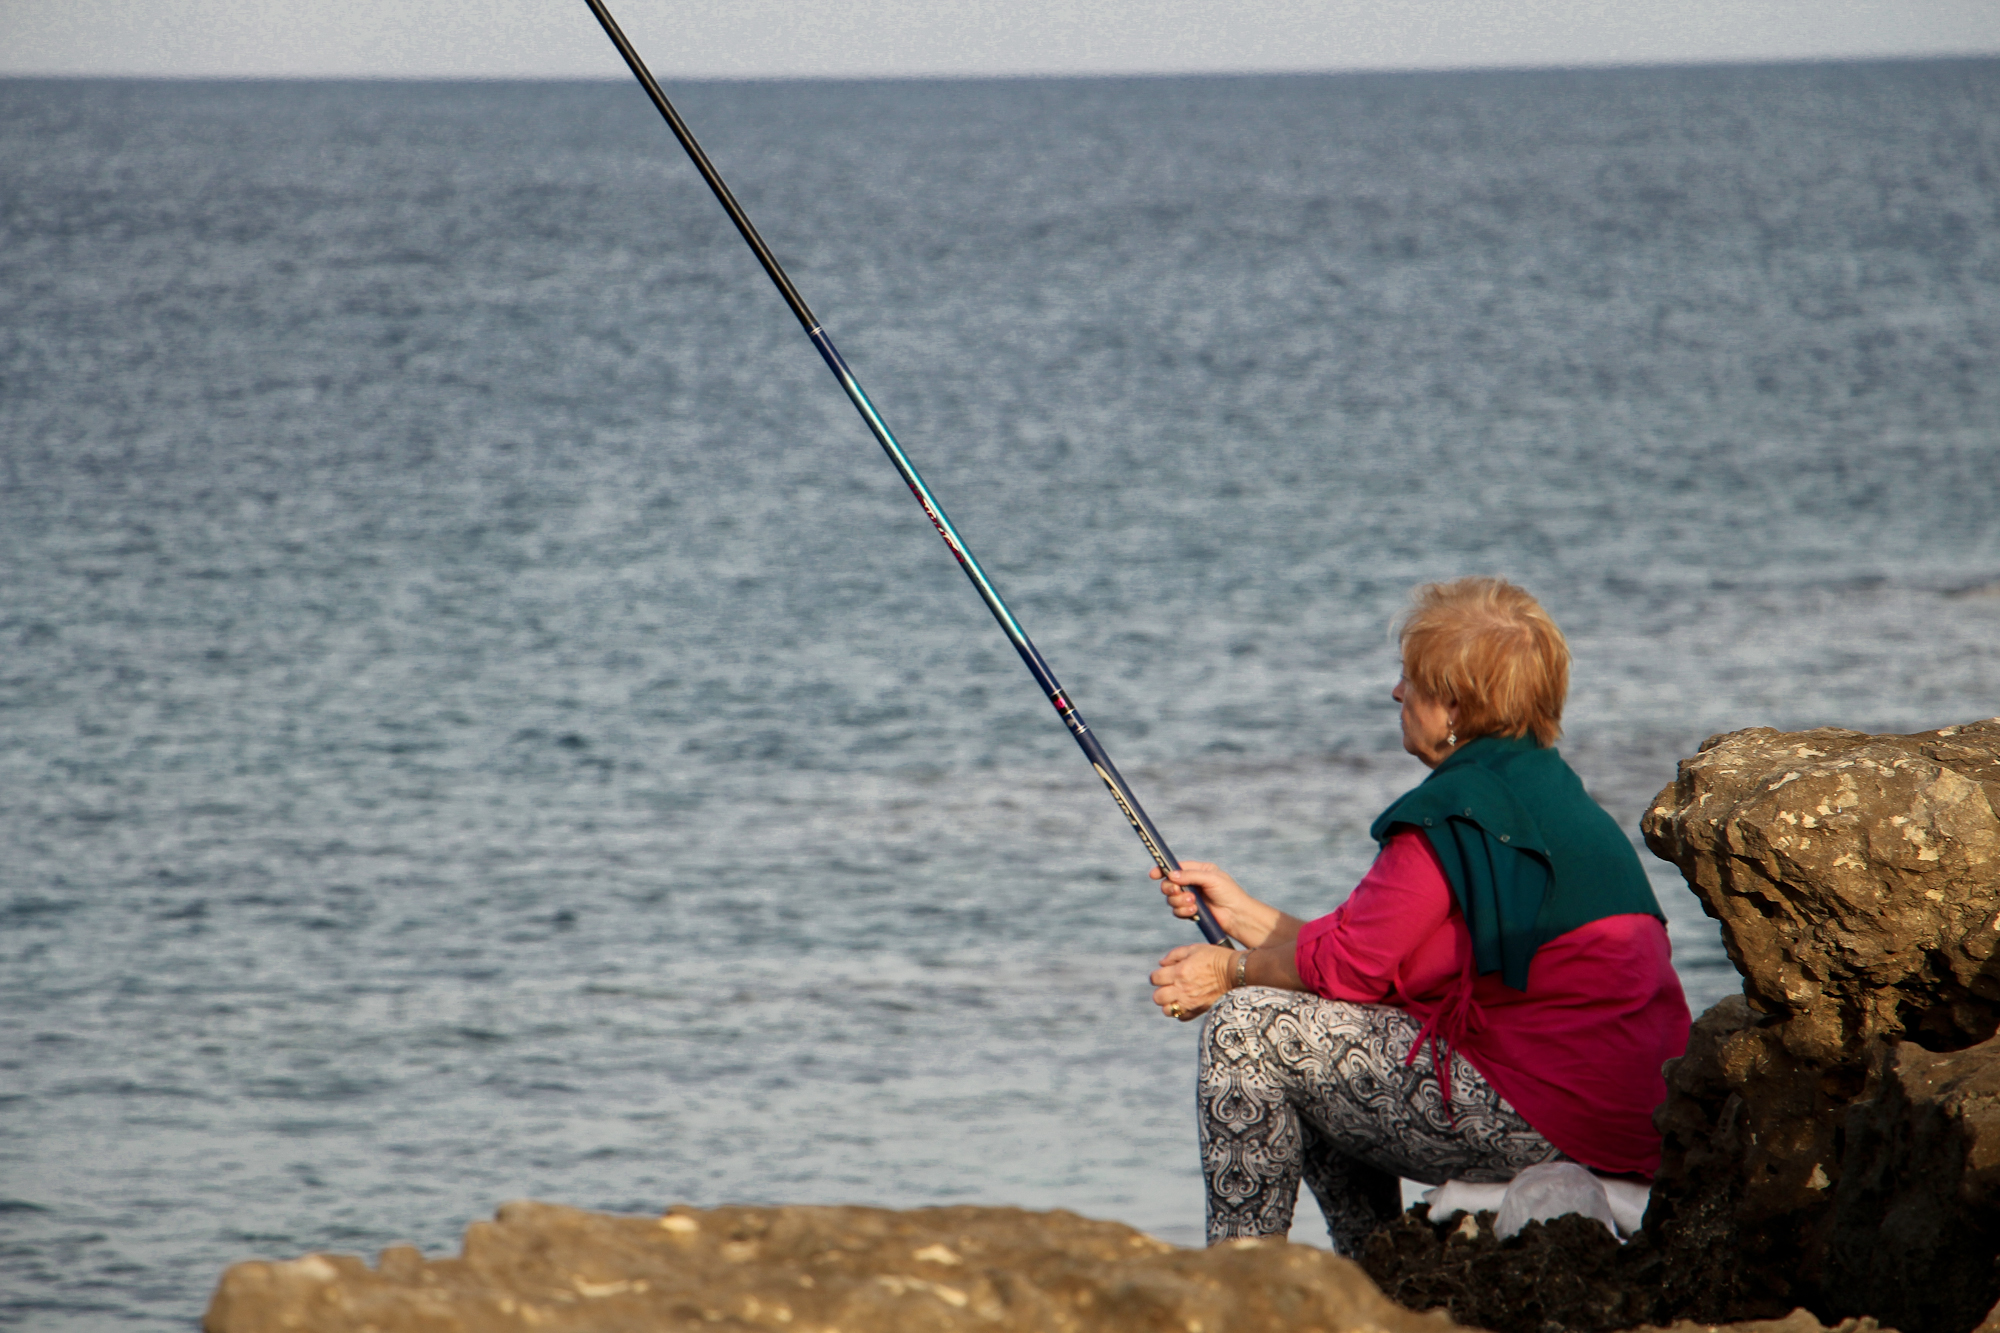 fisherman #2